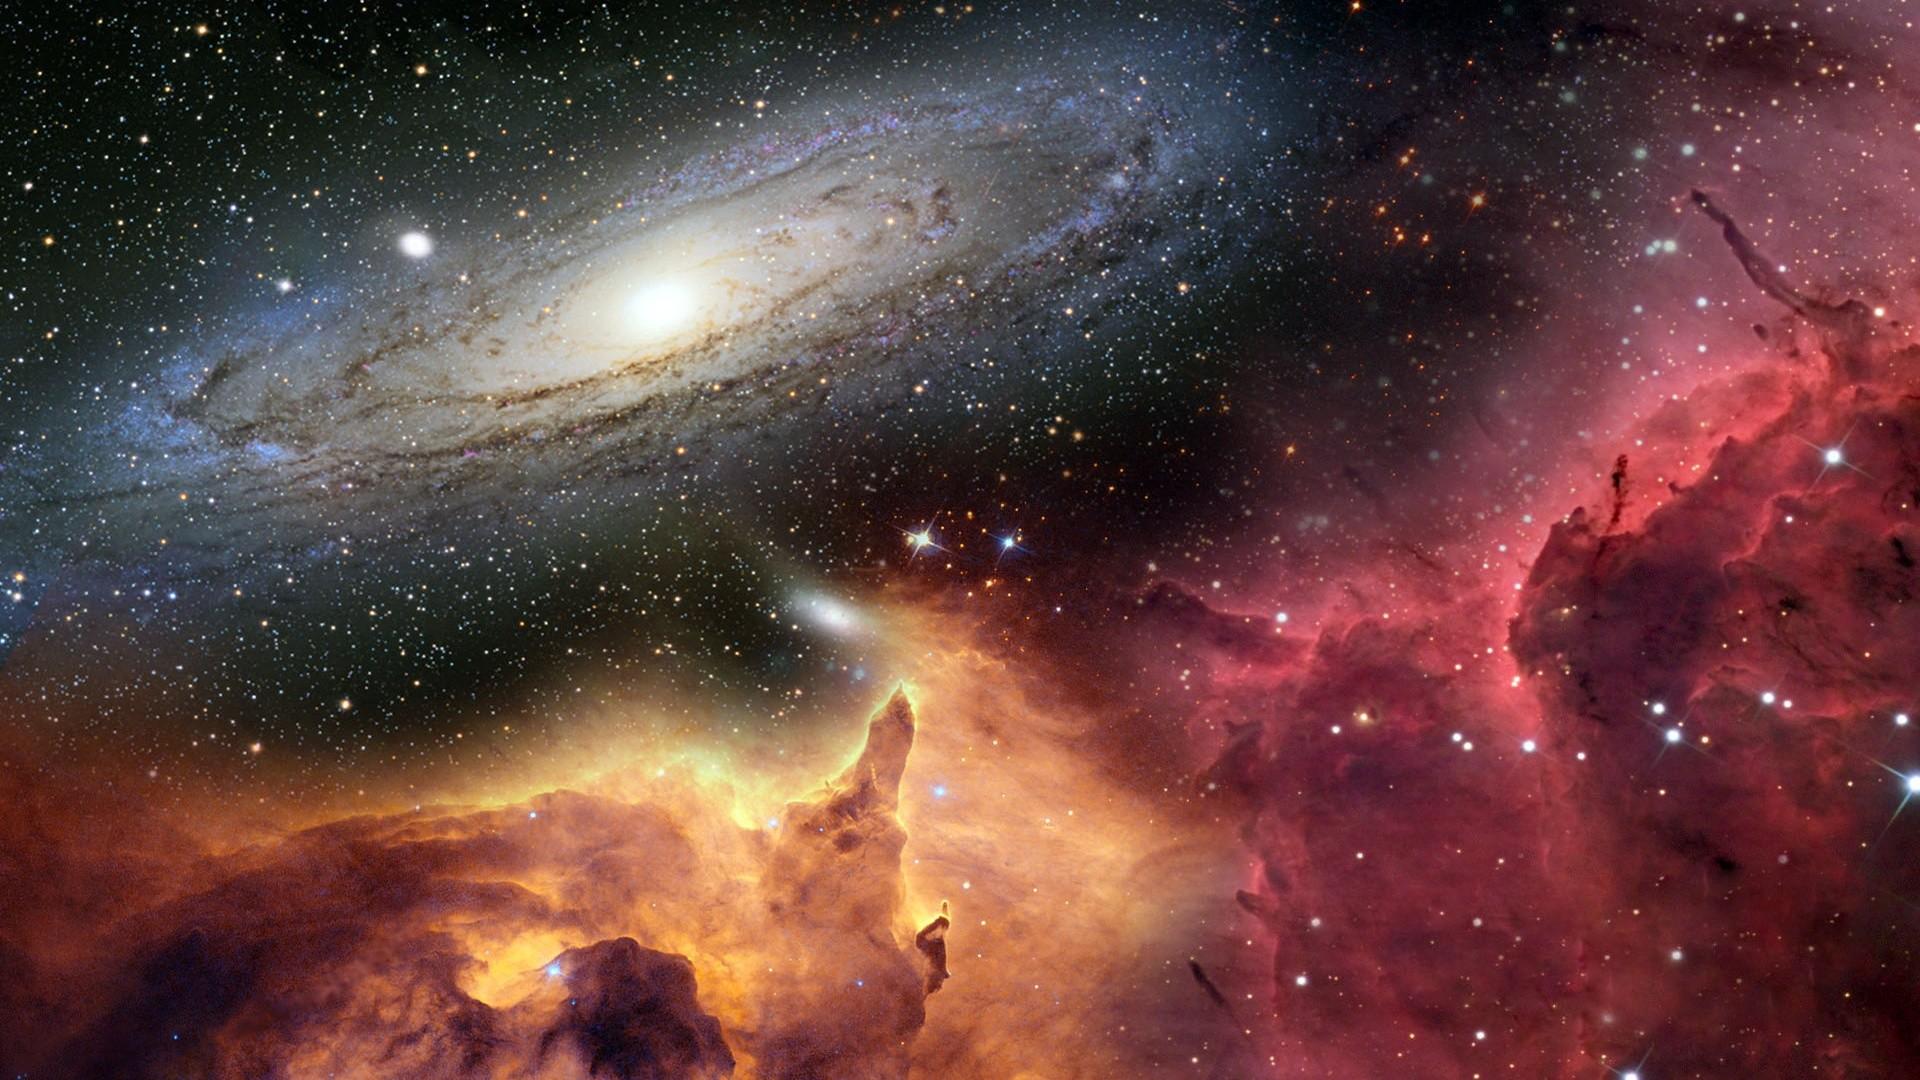 Universe Wallpapers HD Pics